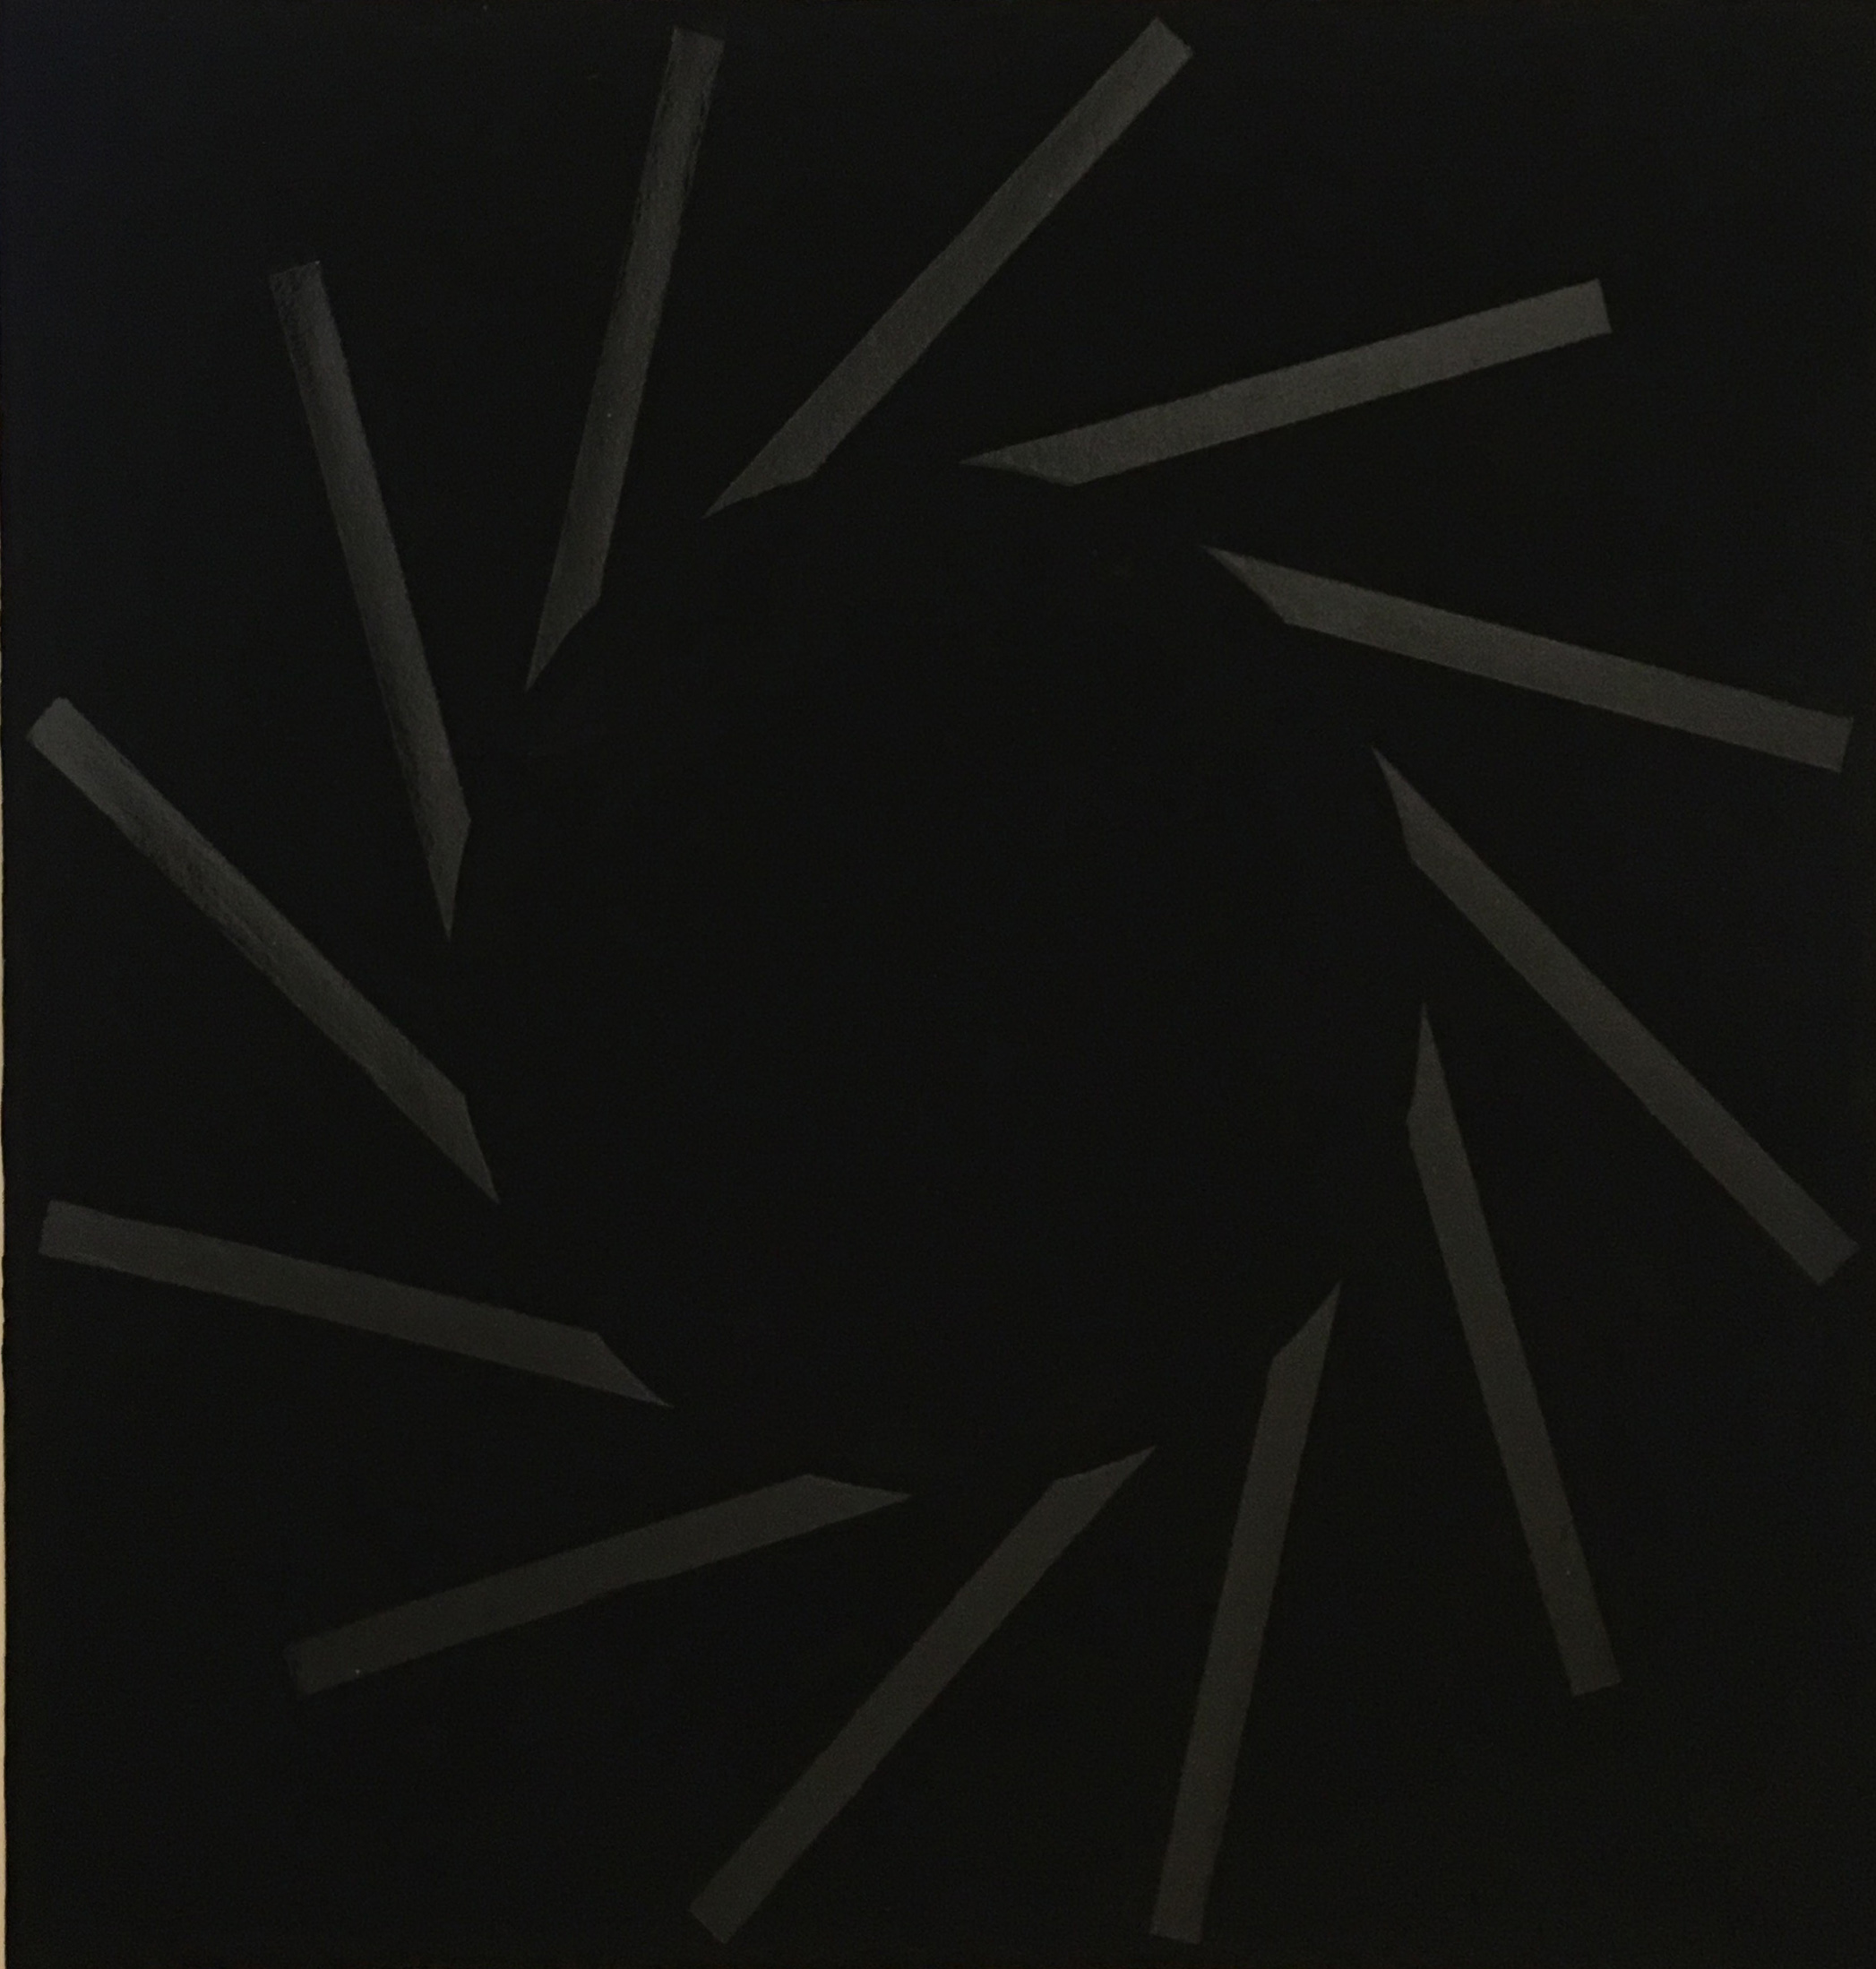 Paul Mogensen, Untitled,  c. 2014-2016, Black acrylic & black gouache, 22h x 30w in.